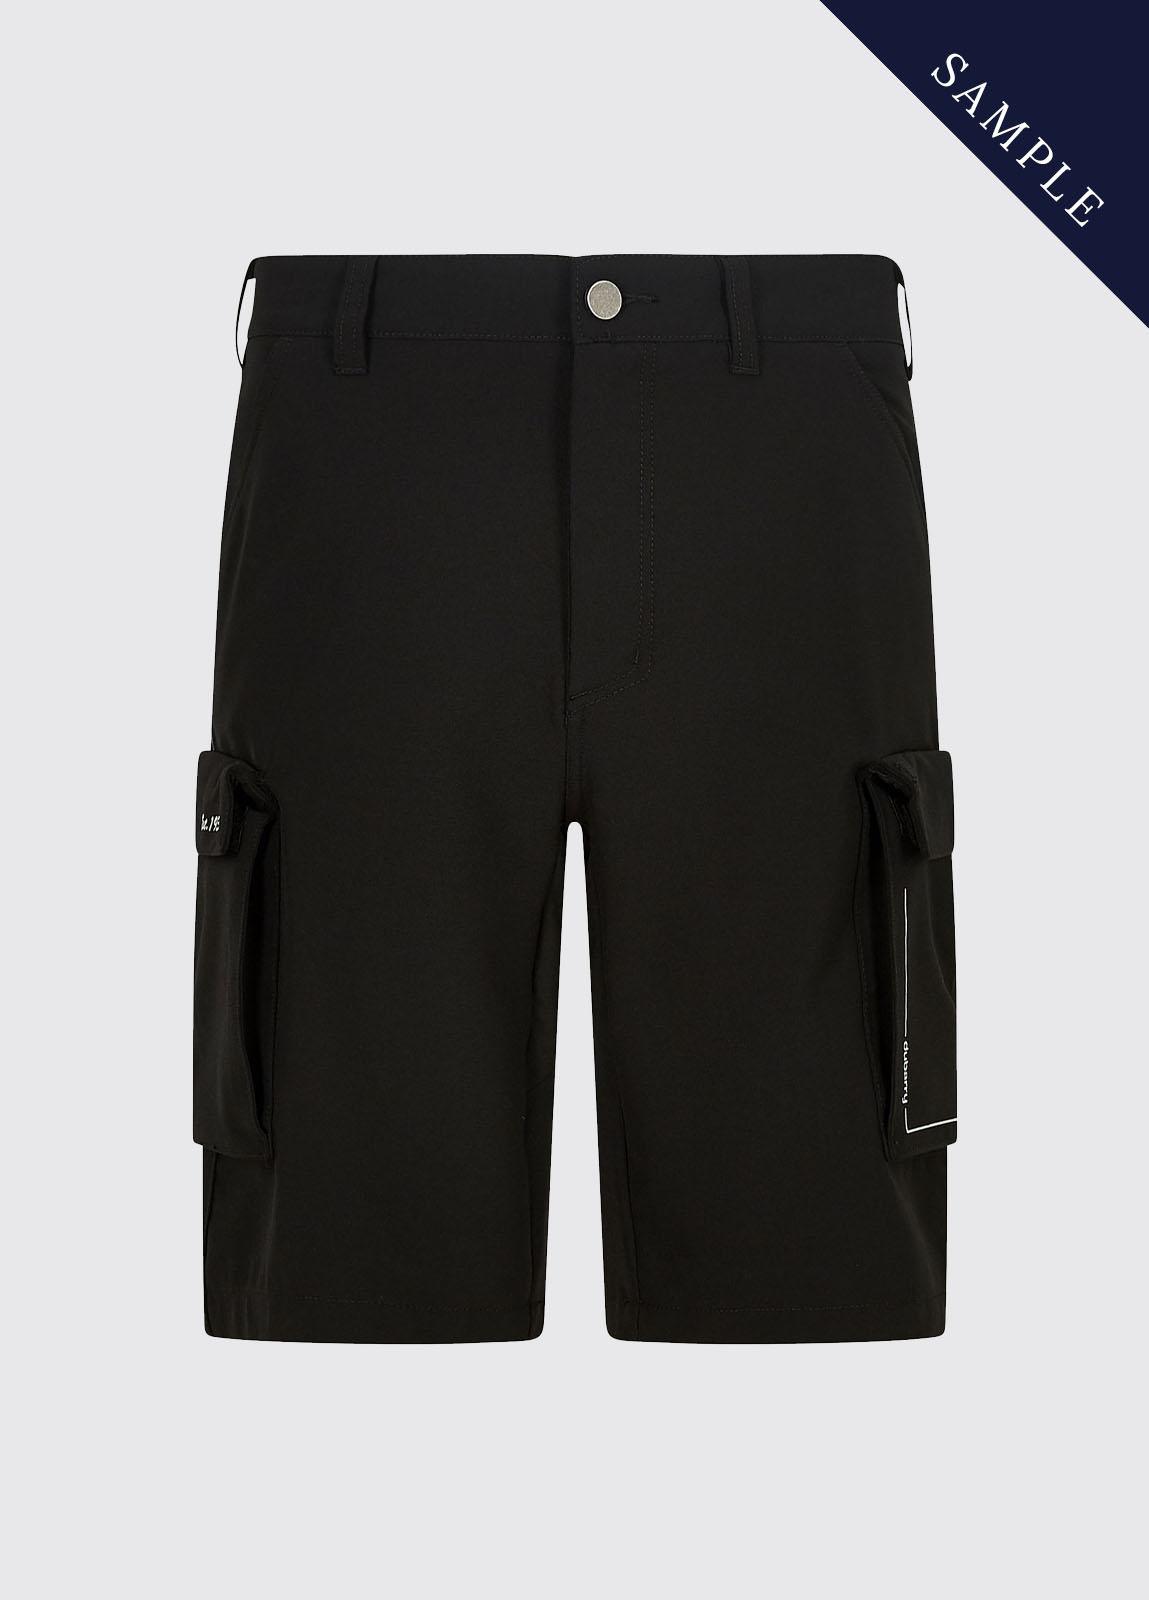 Sherkin - Black - Size EU 32